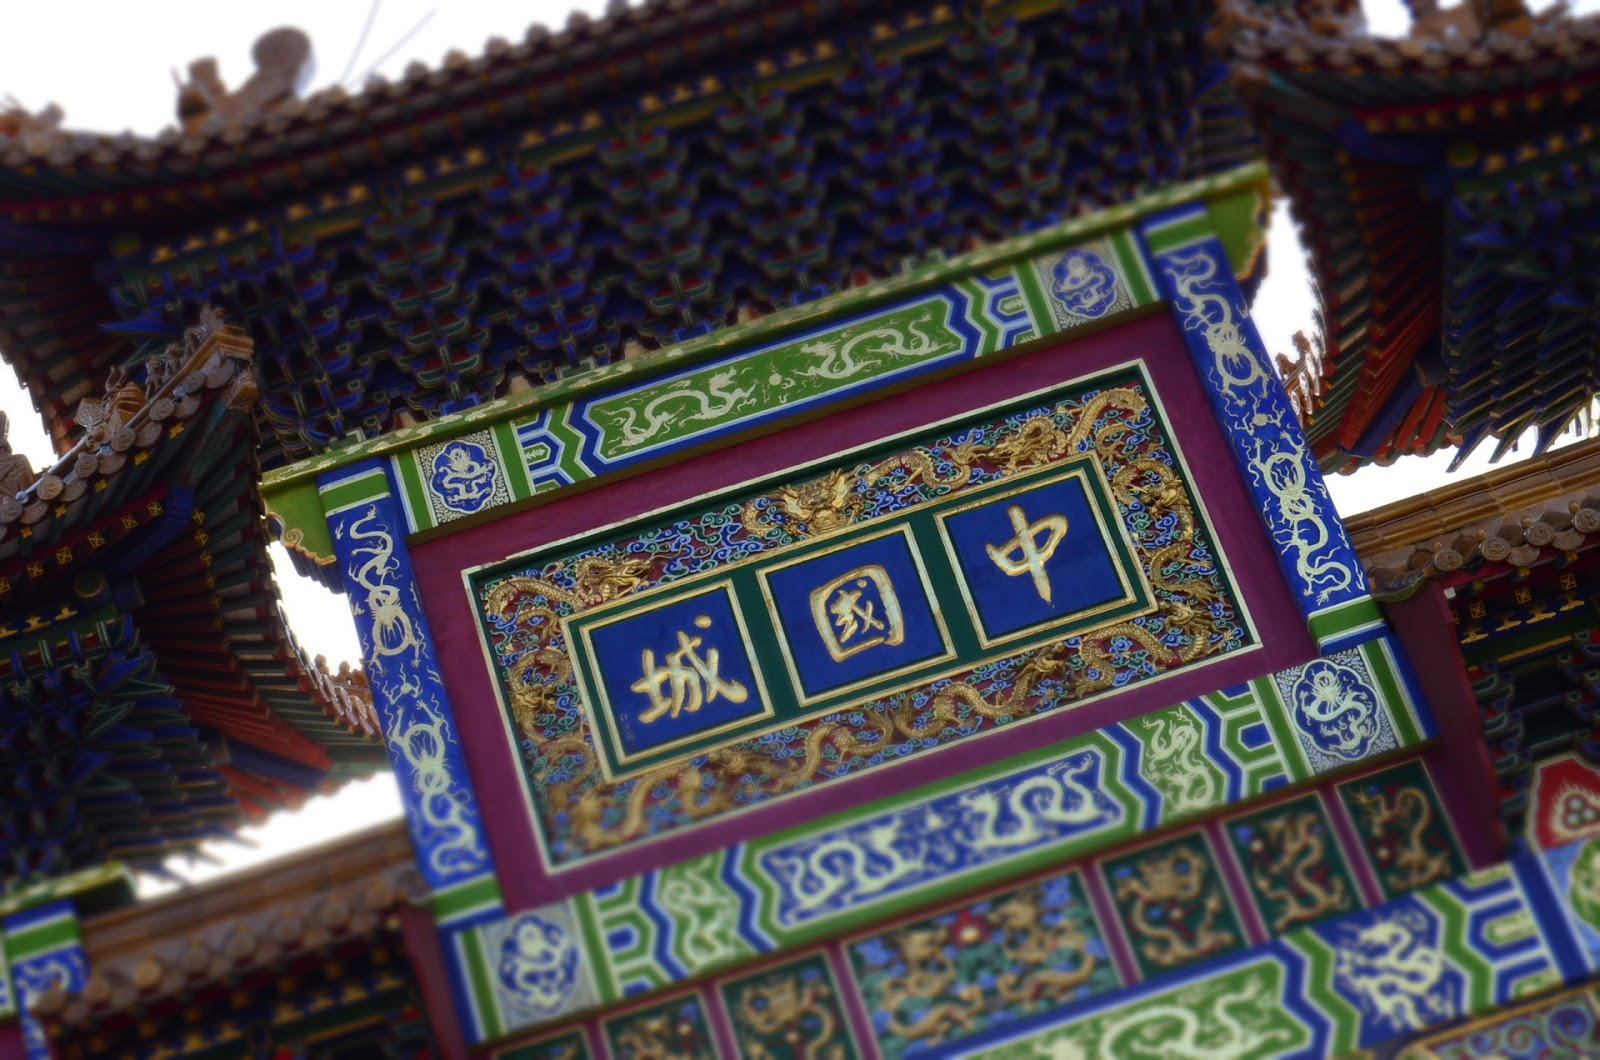 Wallpaper Around An Arch